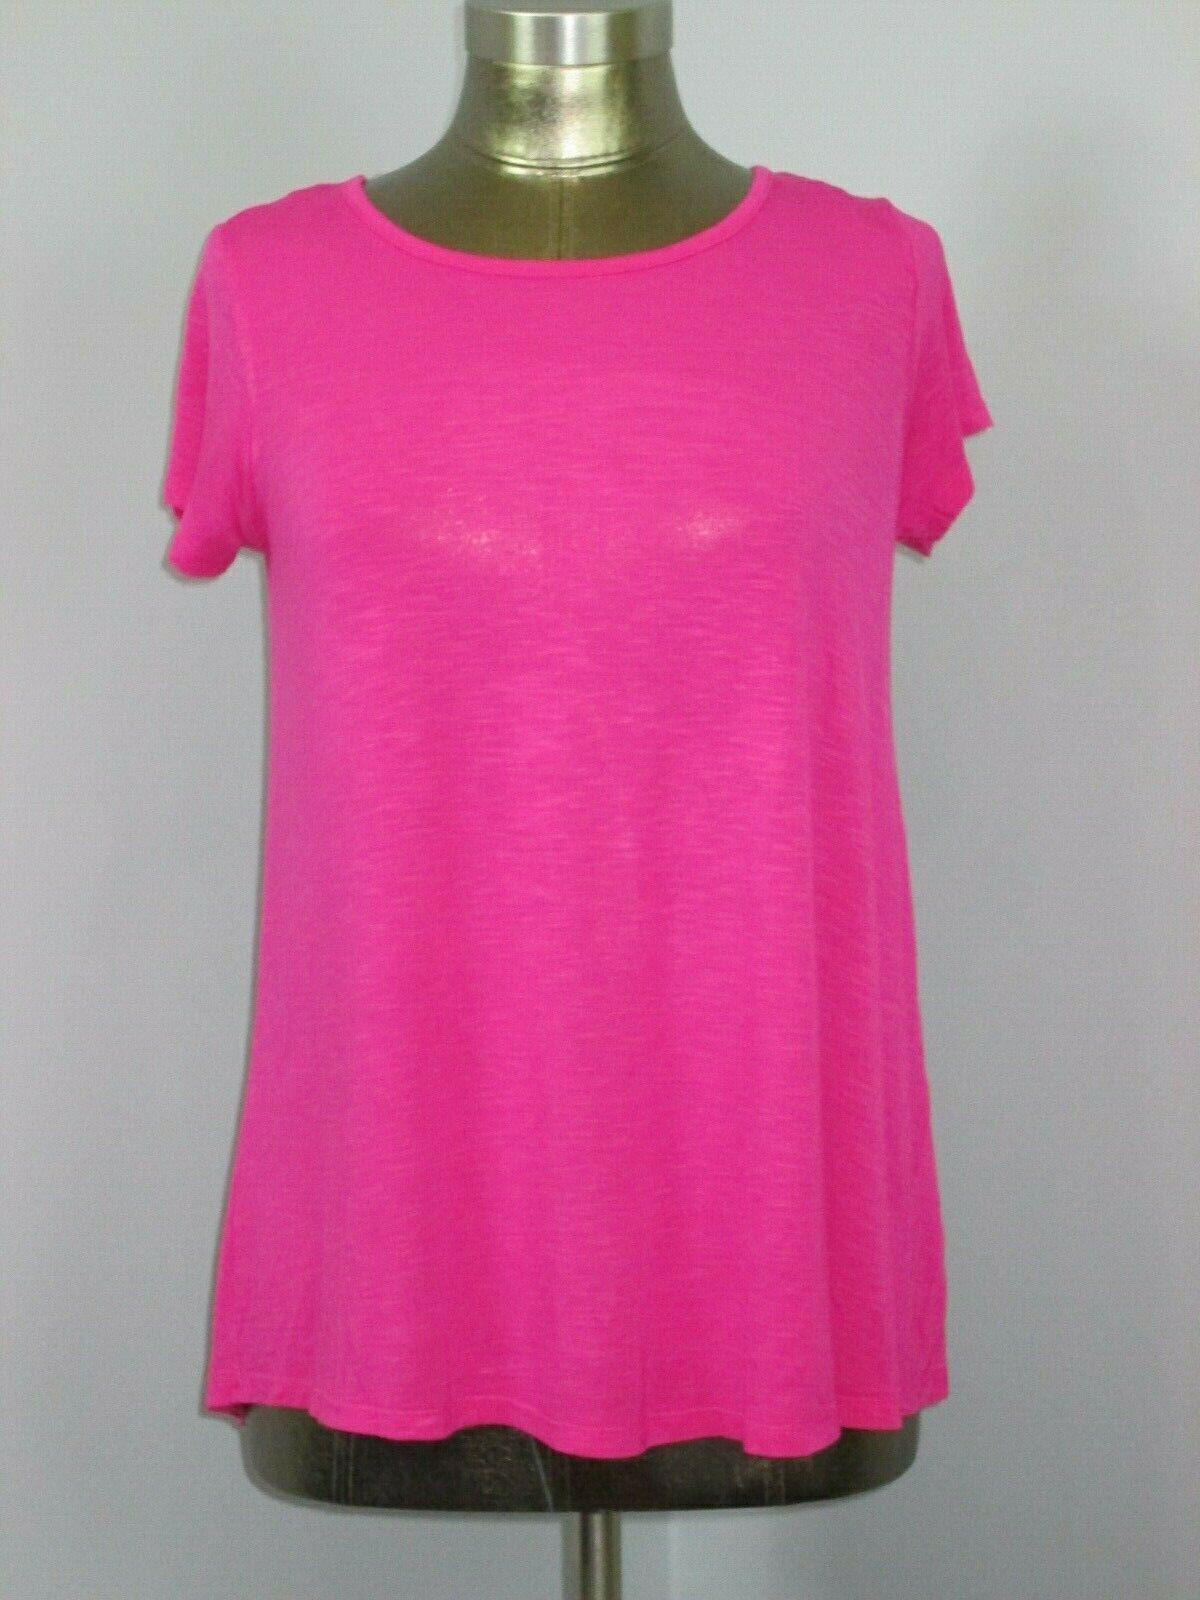 NWOT St Johns Bay Active Womens Size S (36) Pink Short Sleeve Shirt 317-18490